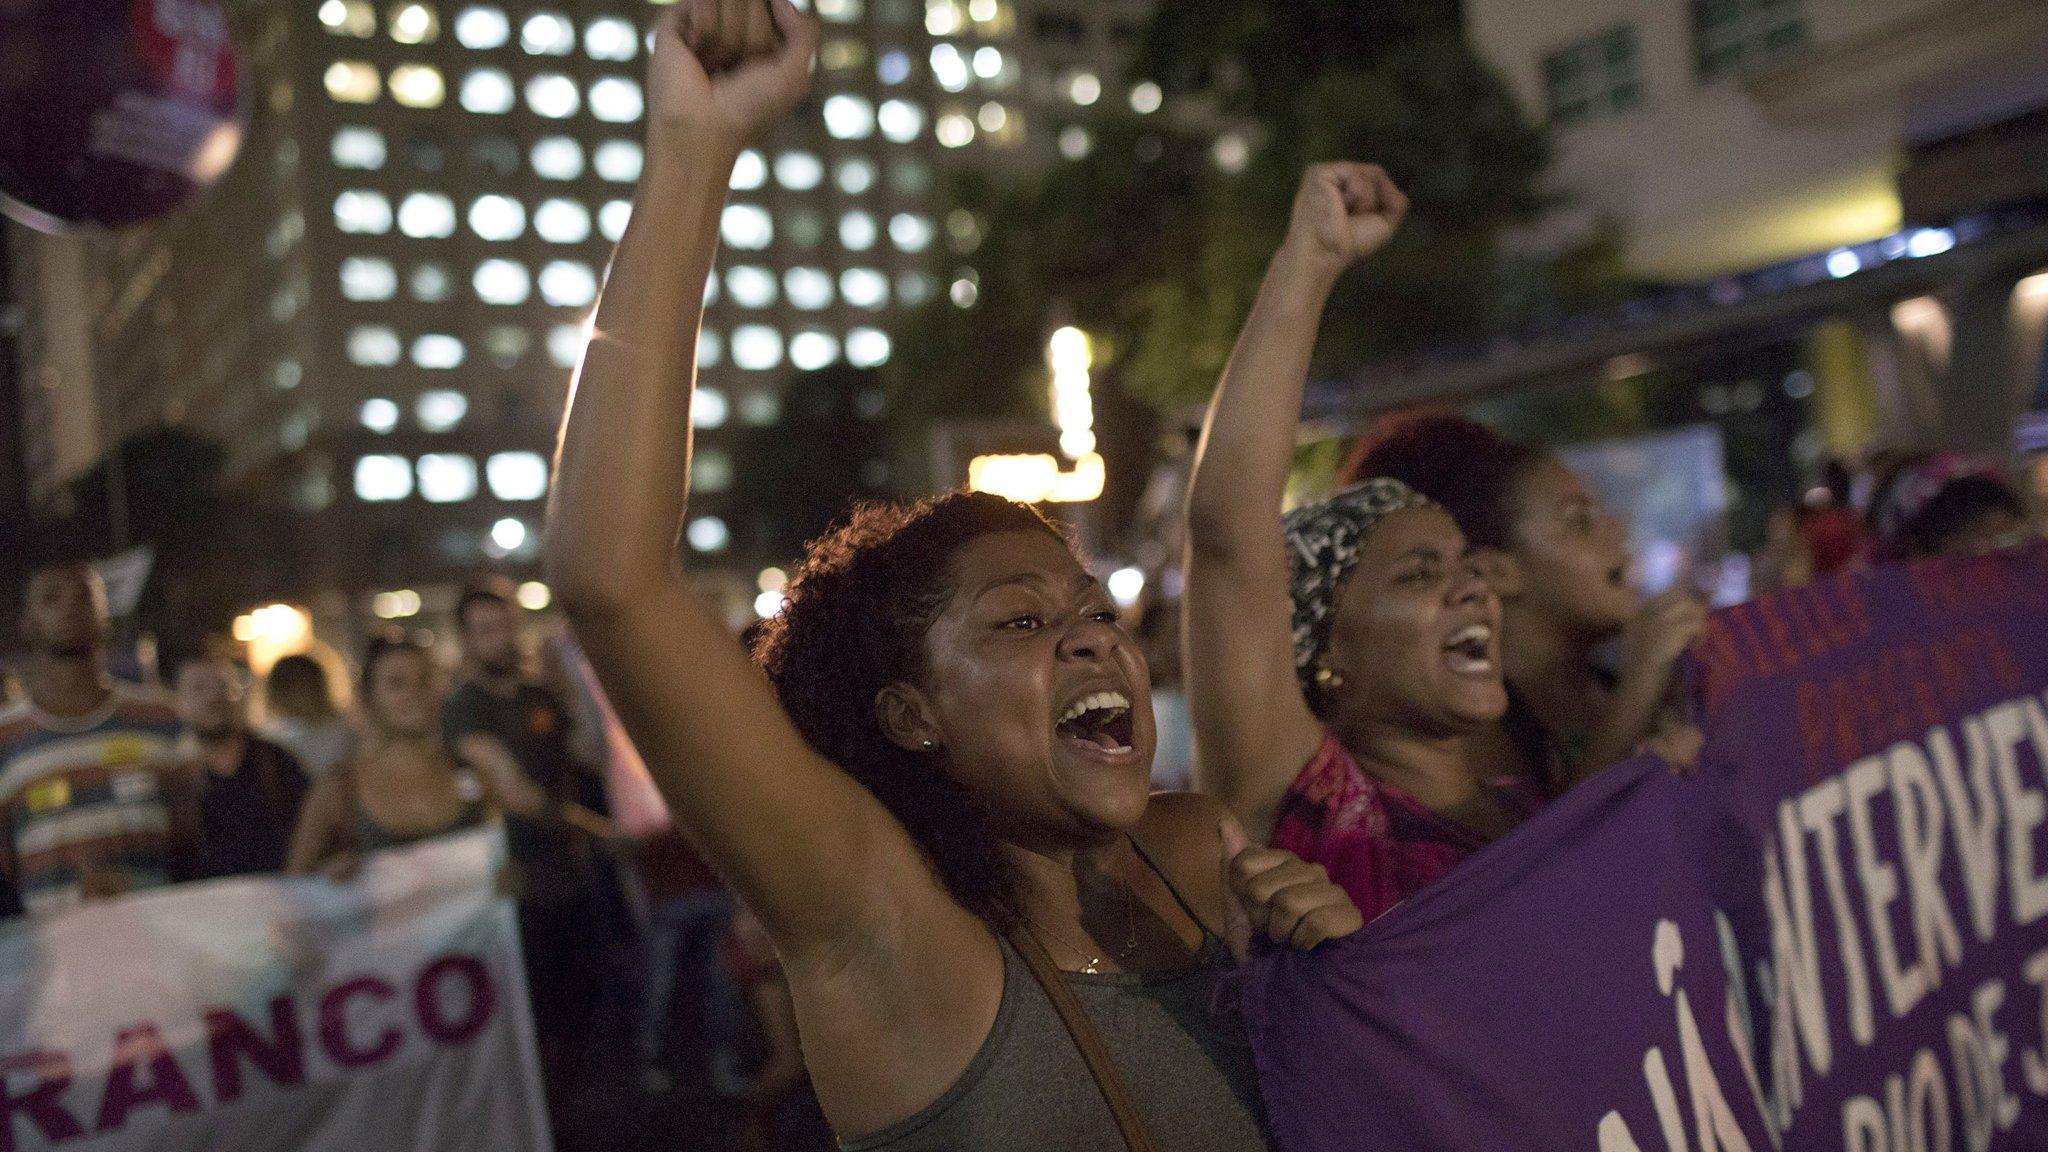 Soap opera row shines light on treatment of black Brazilians